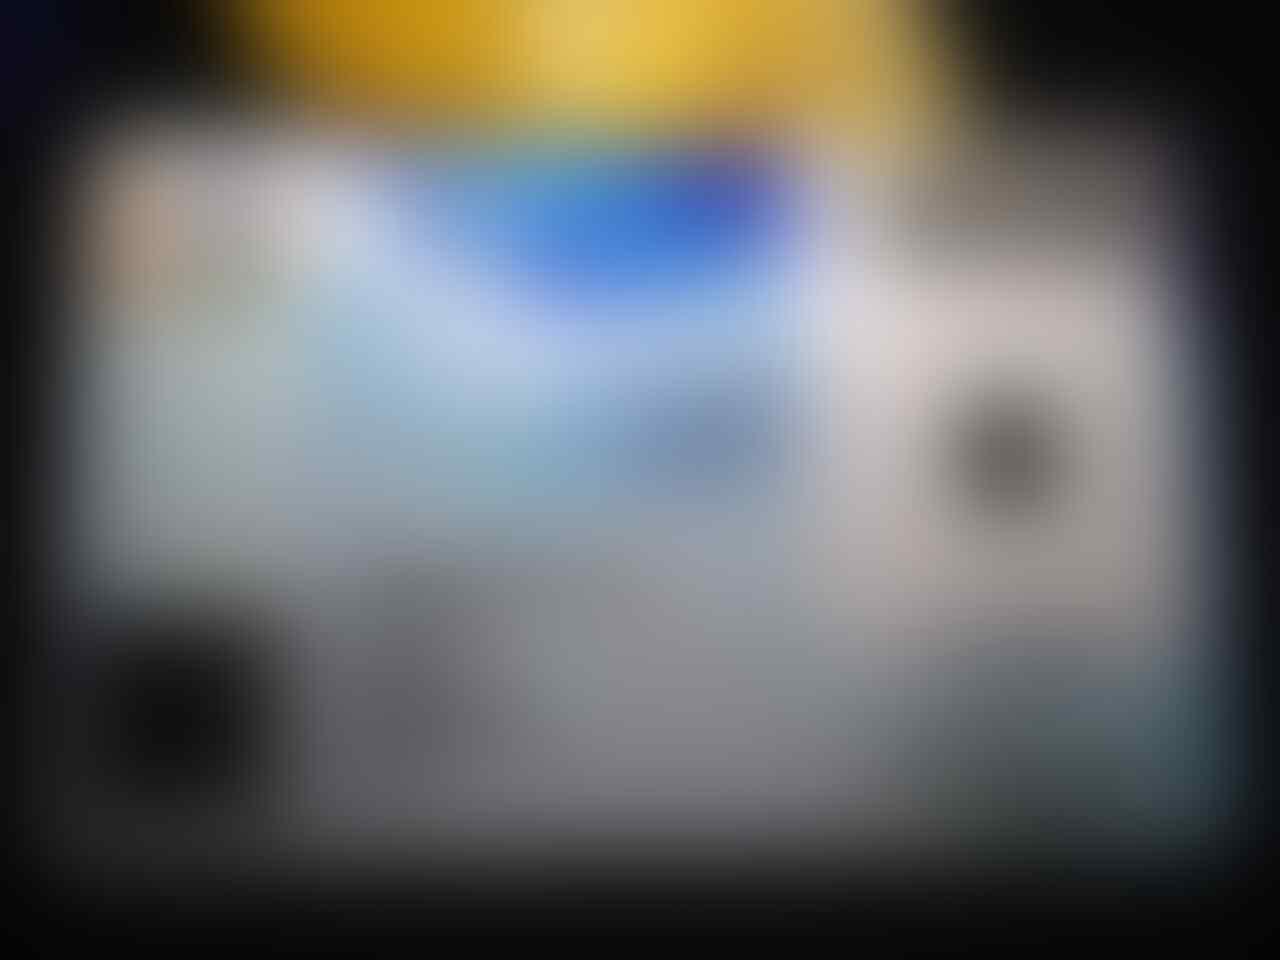 PART13 - K A R M A - CLOSED 11 JULI 2018